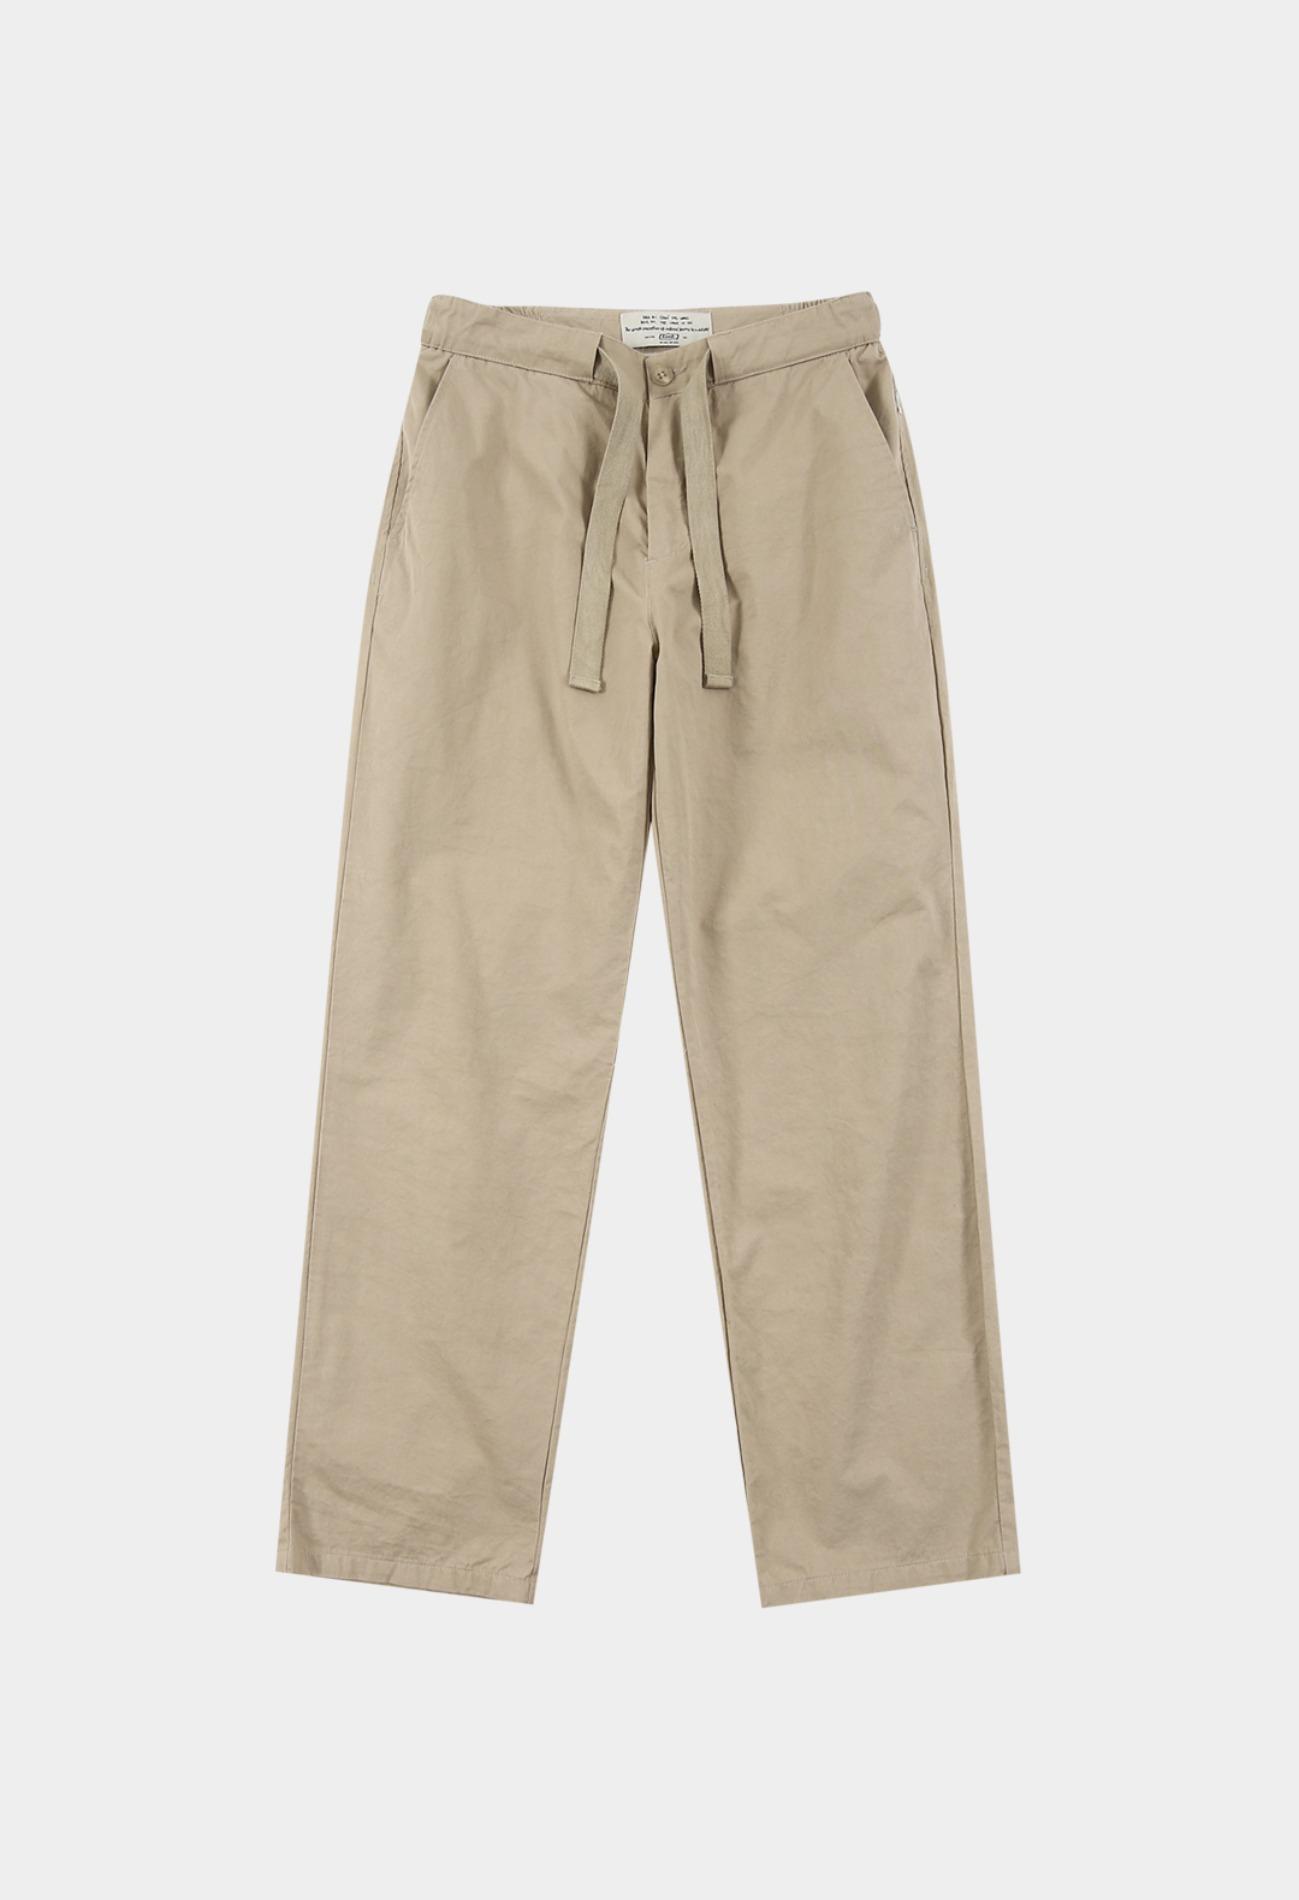 keek Banding Belted Pants - Beige 스트릿패션 유니섹스브랜드 커플시밀러룩 남자쇼핑몰 여성의류쇼핑몰 후드티 힙색